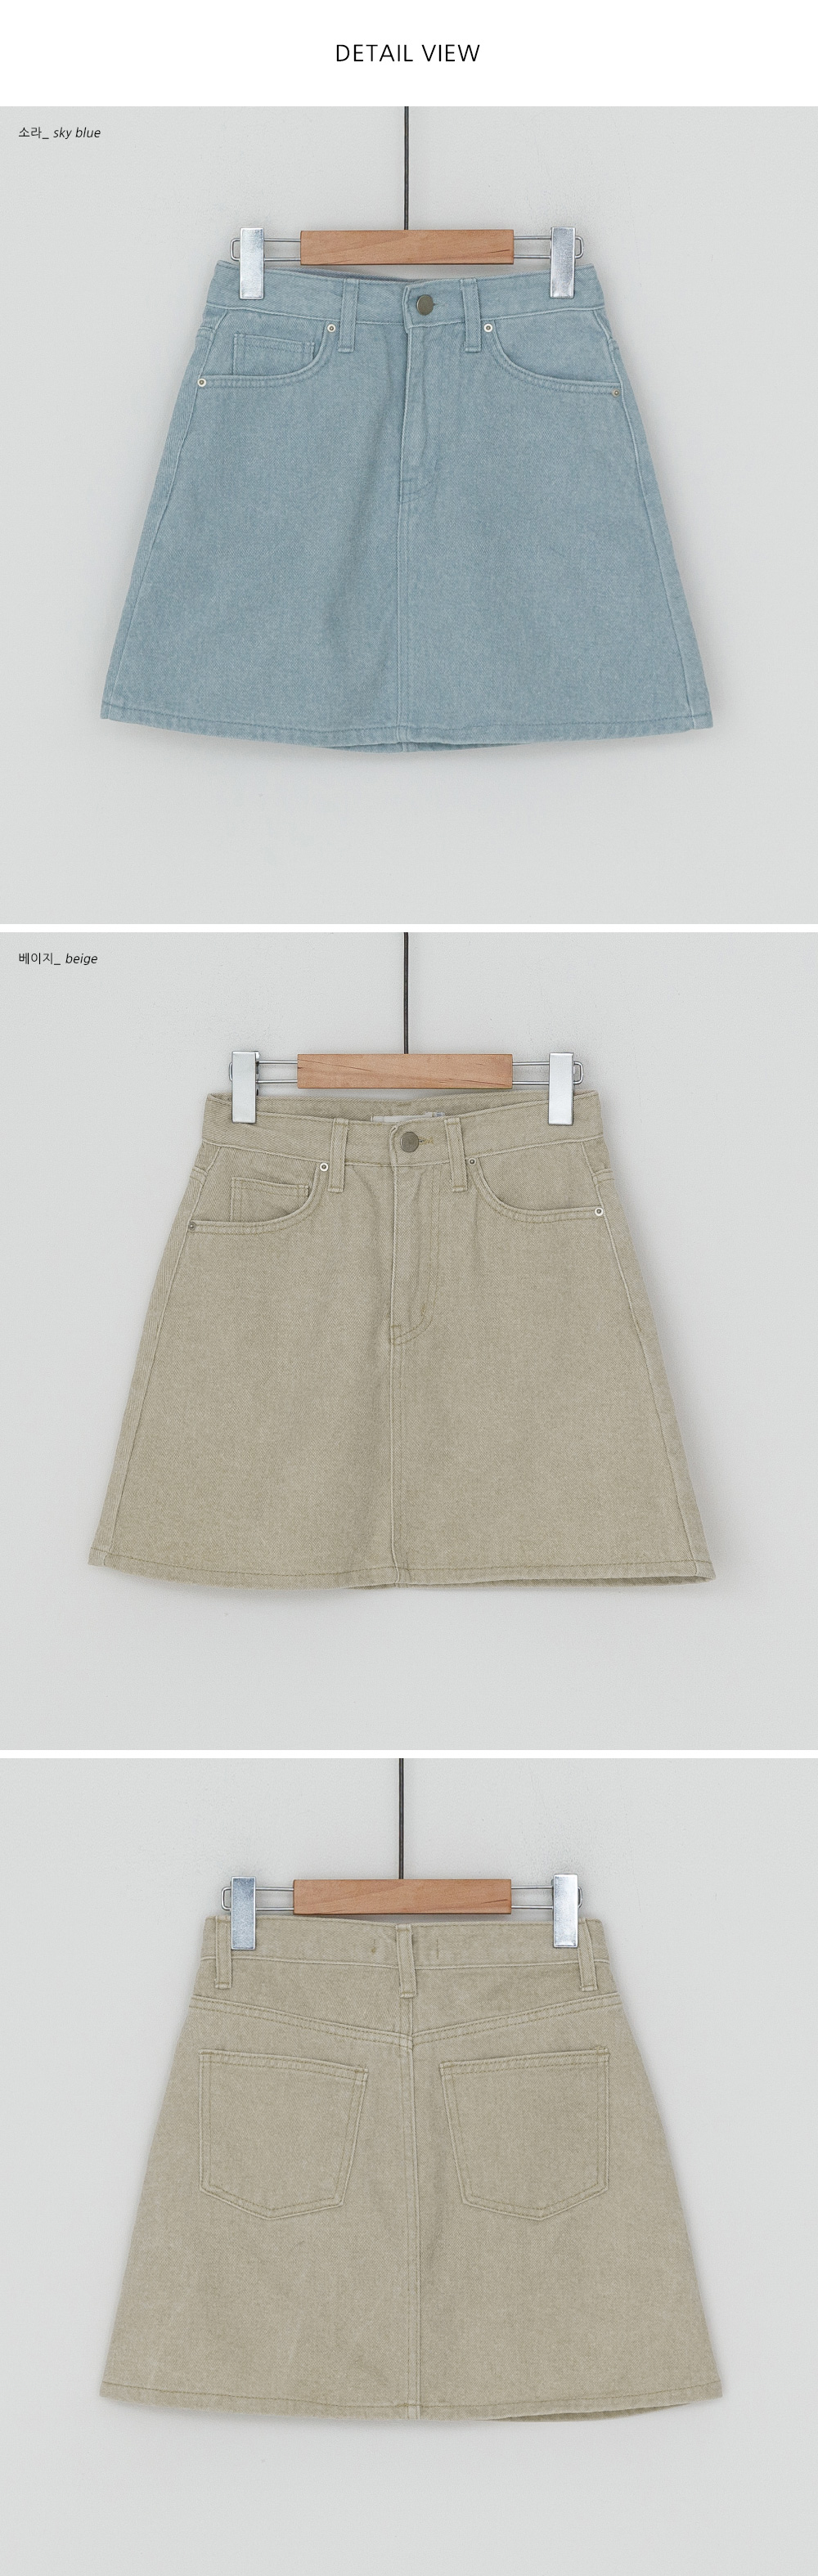 High waist dying mini skirt